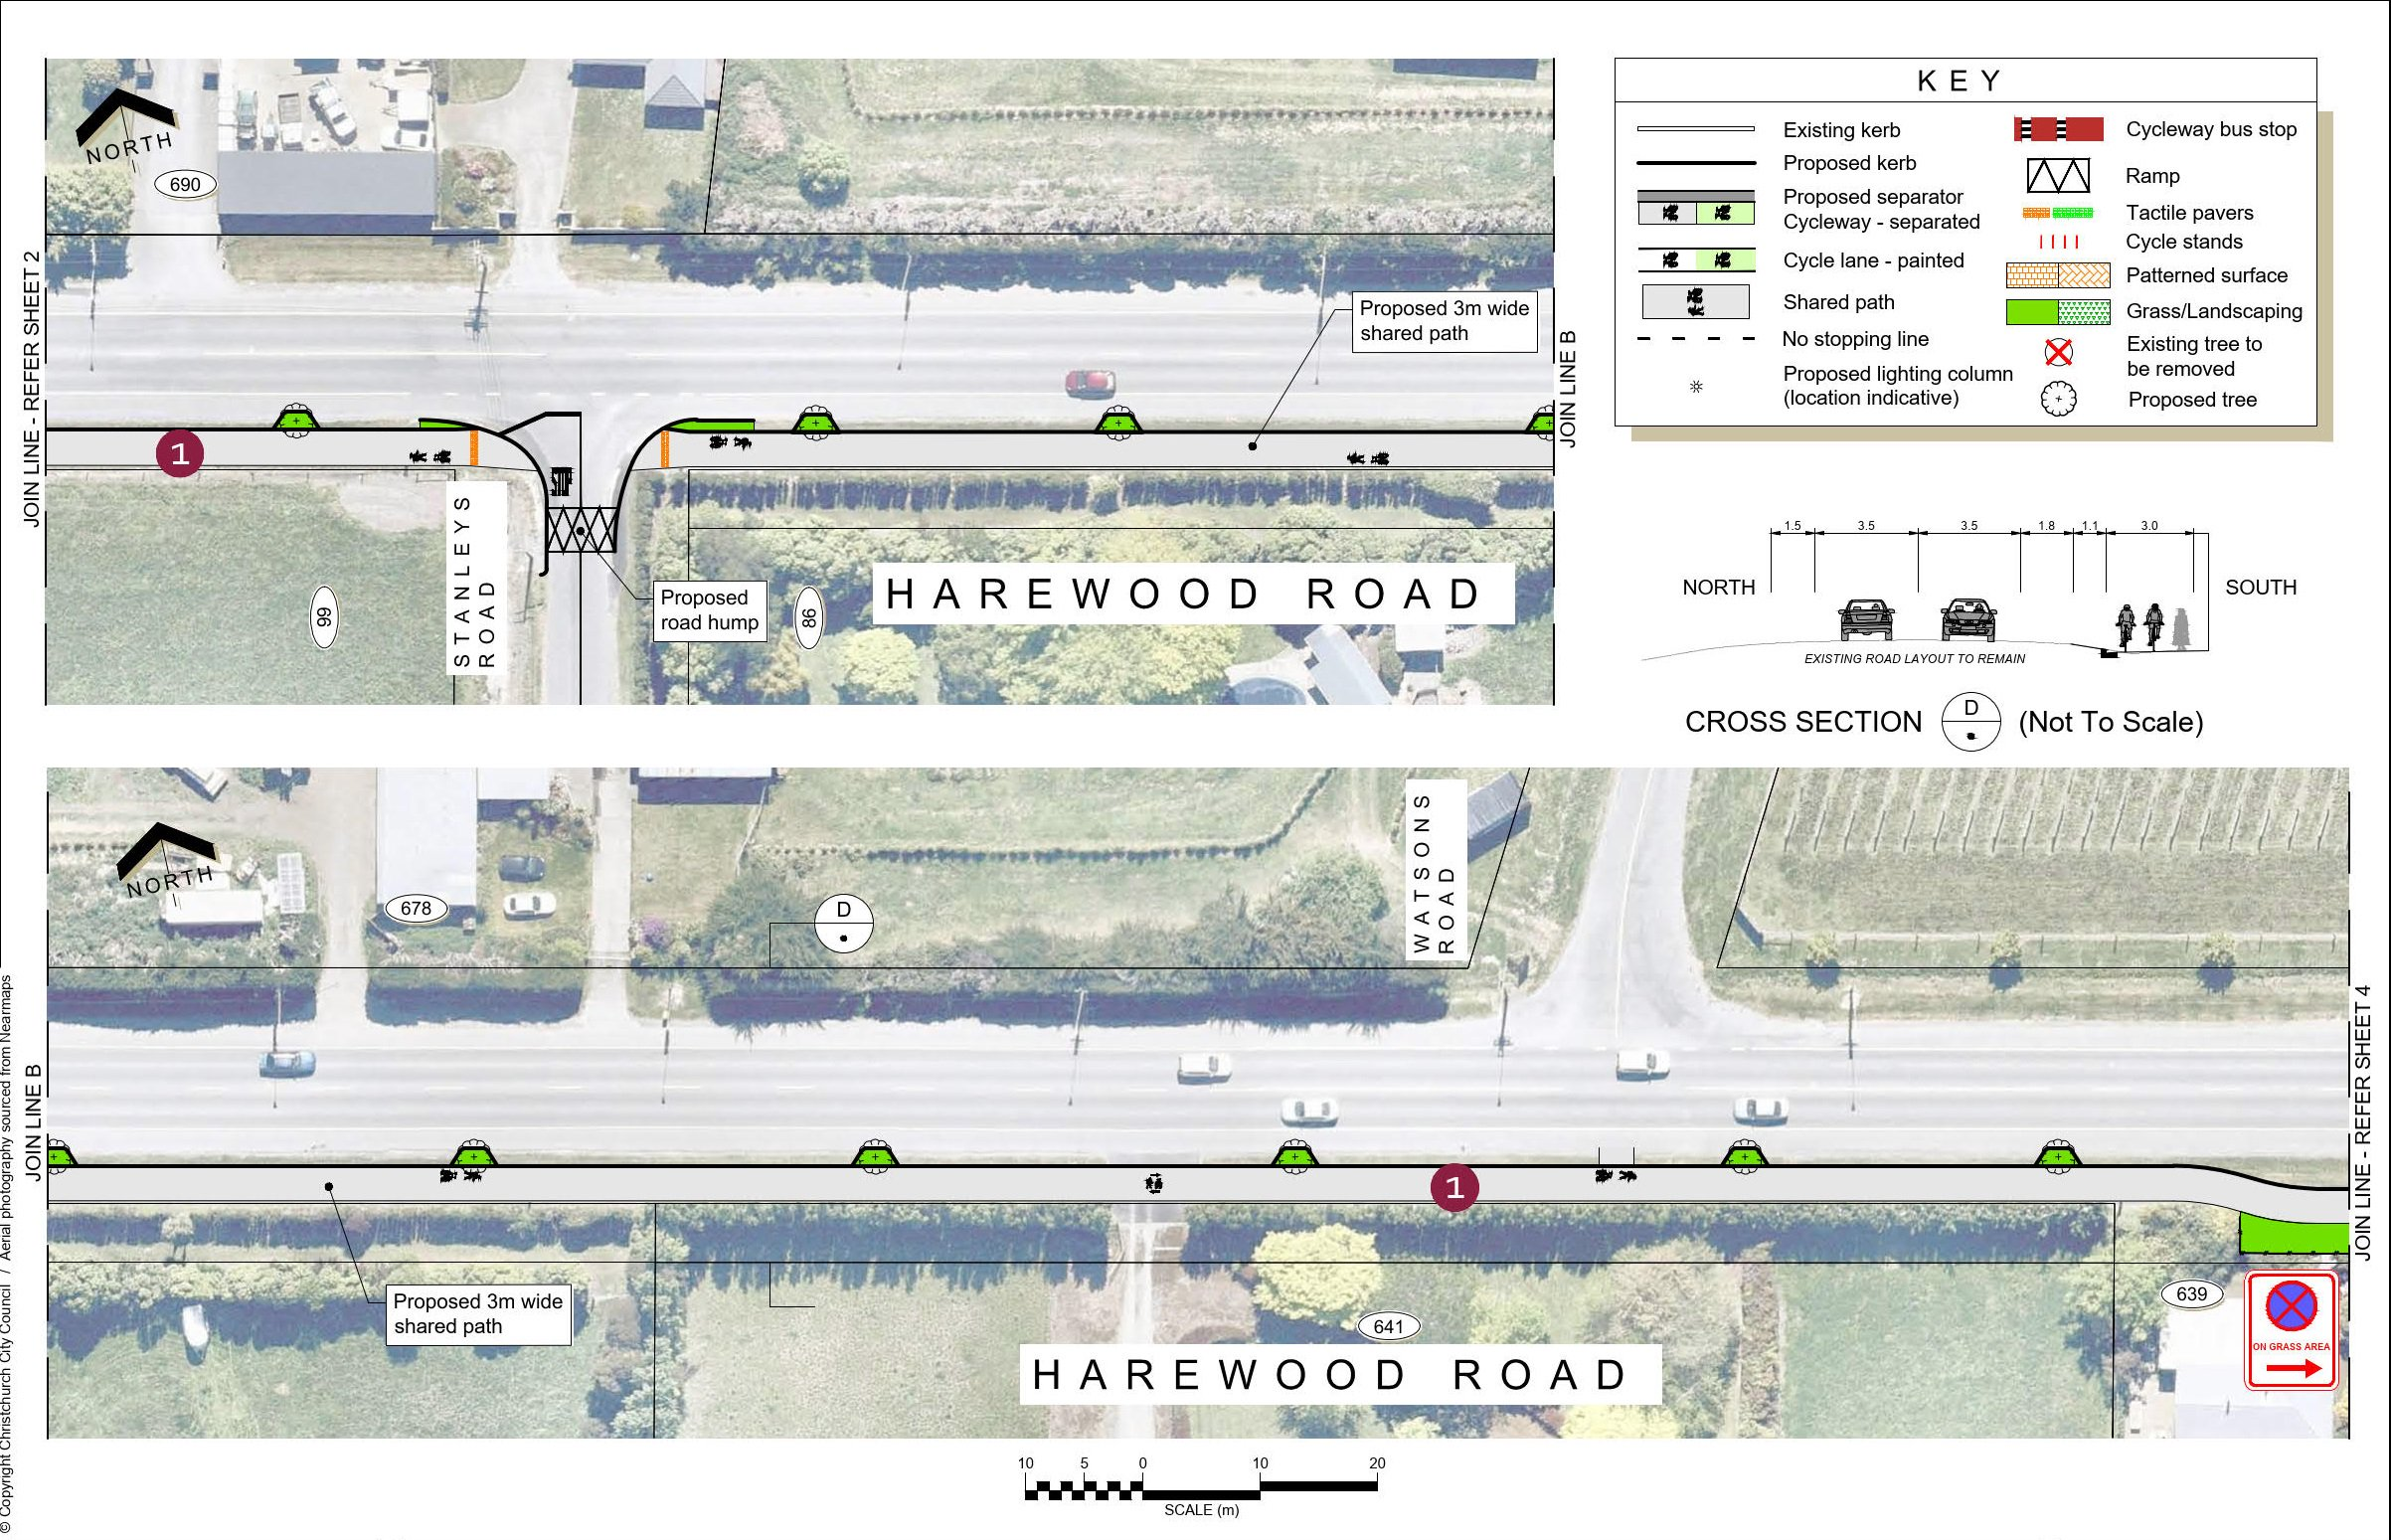 Plan 3 - 690 Harewood Road to Watsons Road